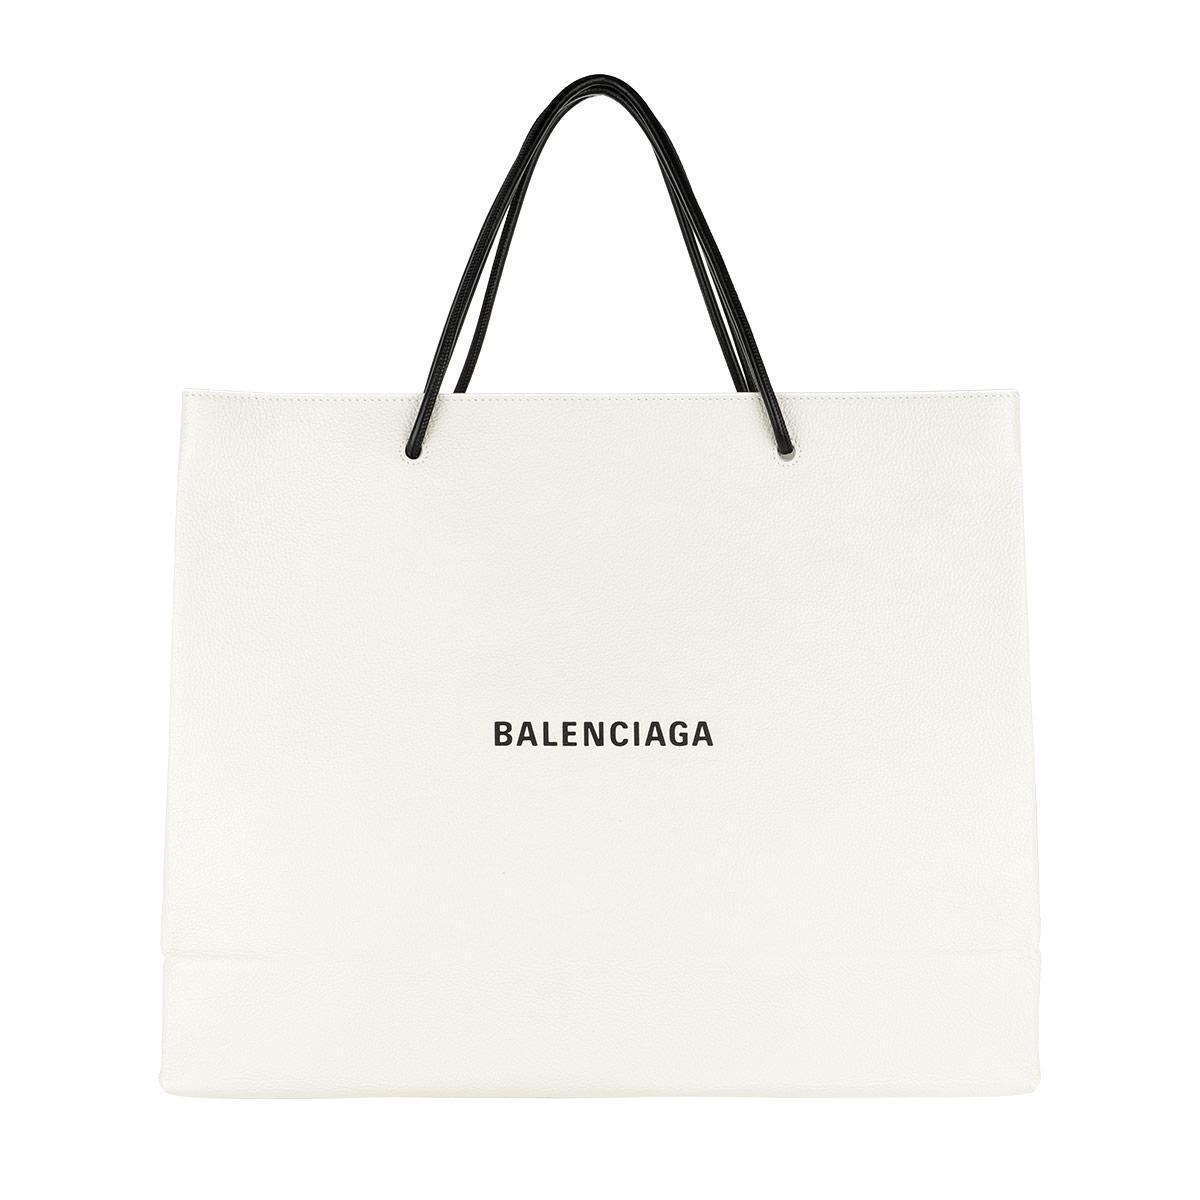 Balenciaga Shopper - Classic City Arena Fettuccia Cerata Tote White - in weiß - für Damen